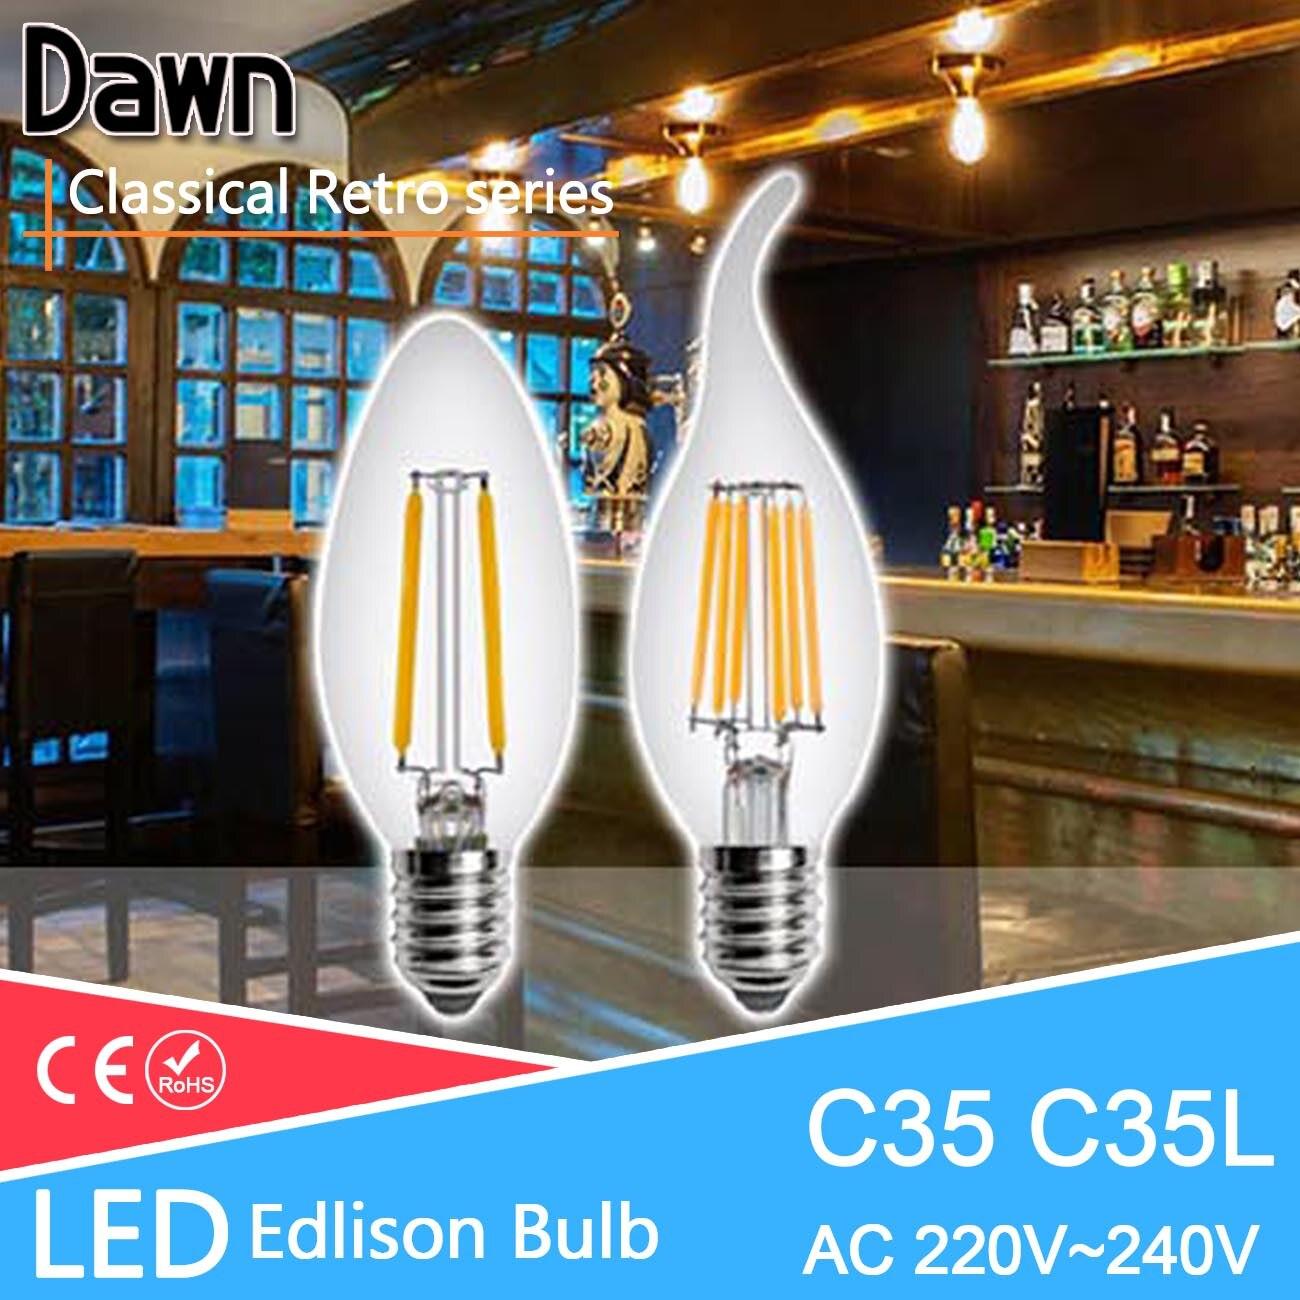 Vintage edison bulb old fashioned lamp classic a60 led 2w or 4w - Classical Vintage Glass Led Edison Lamp E14 Vintage Led Bulb 220v Retro Led Filament Light Candle